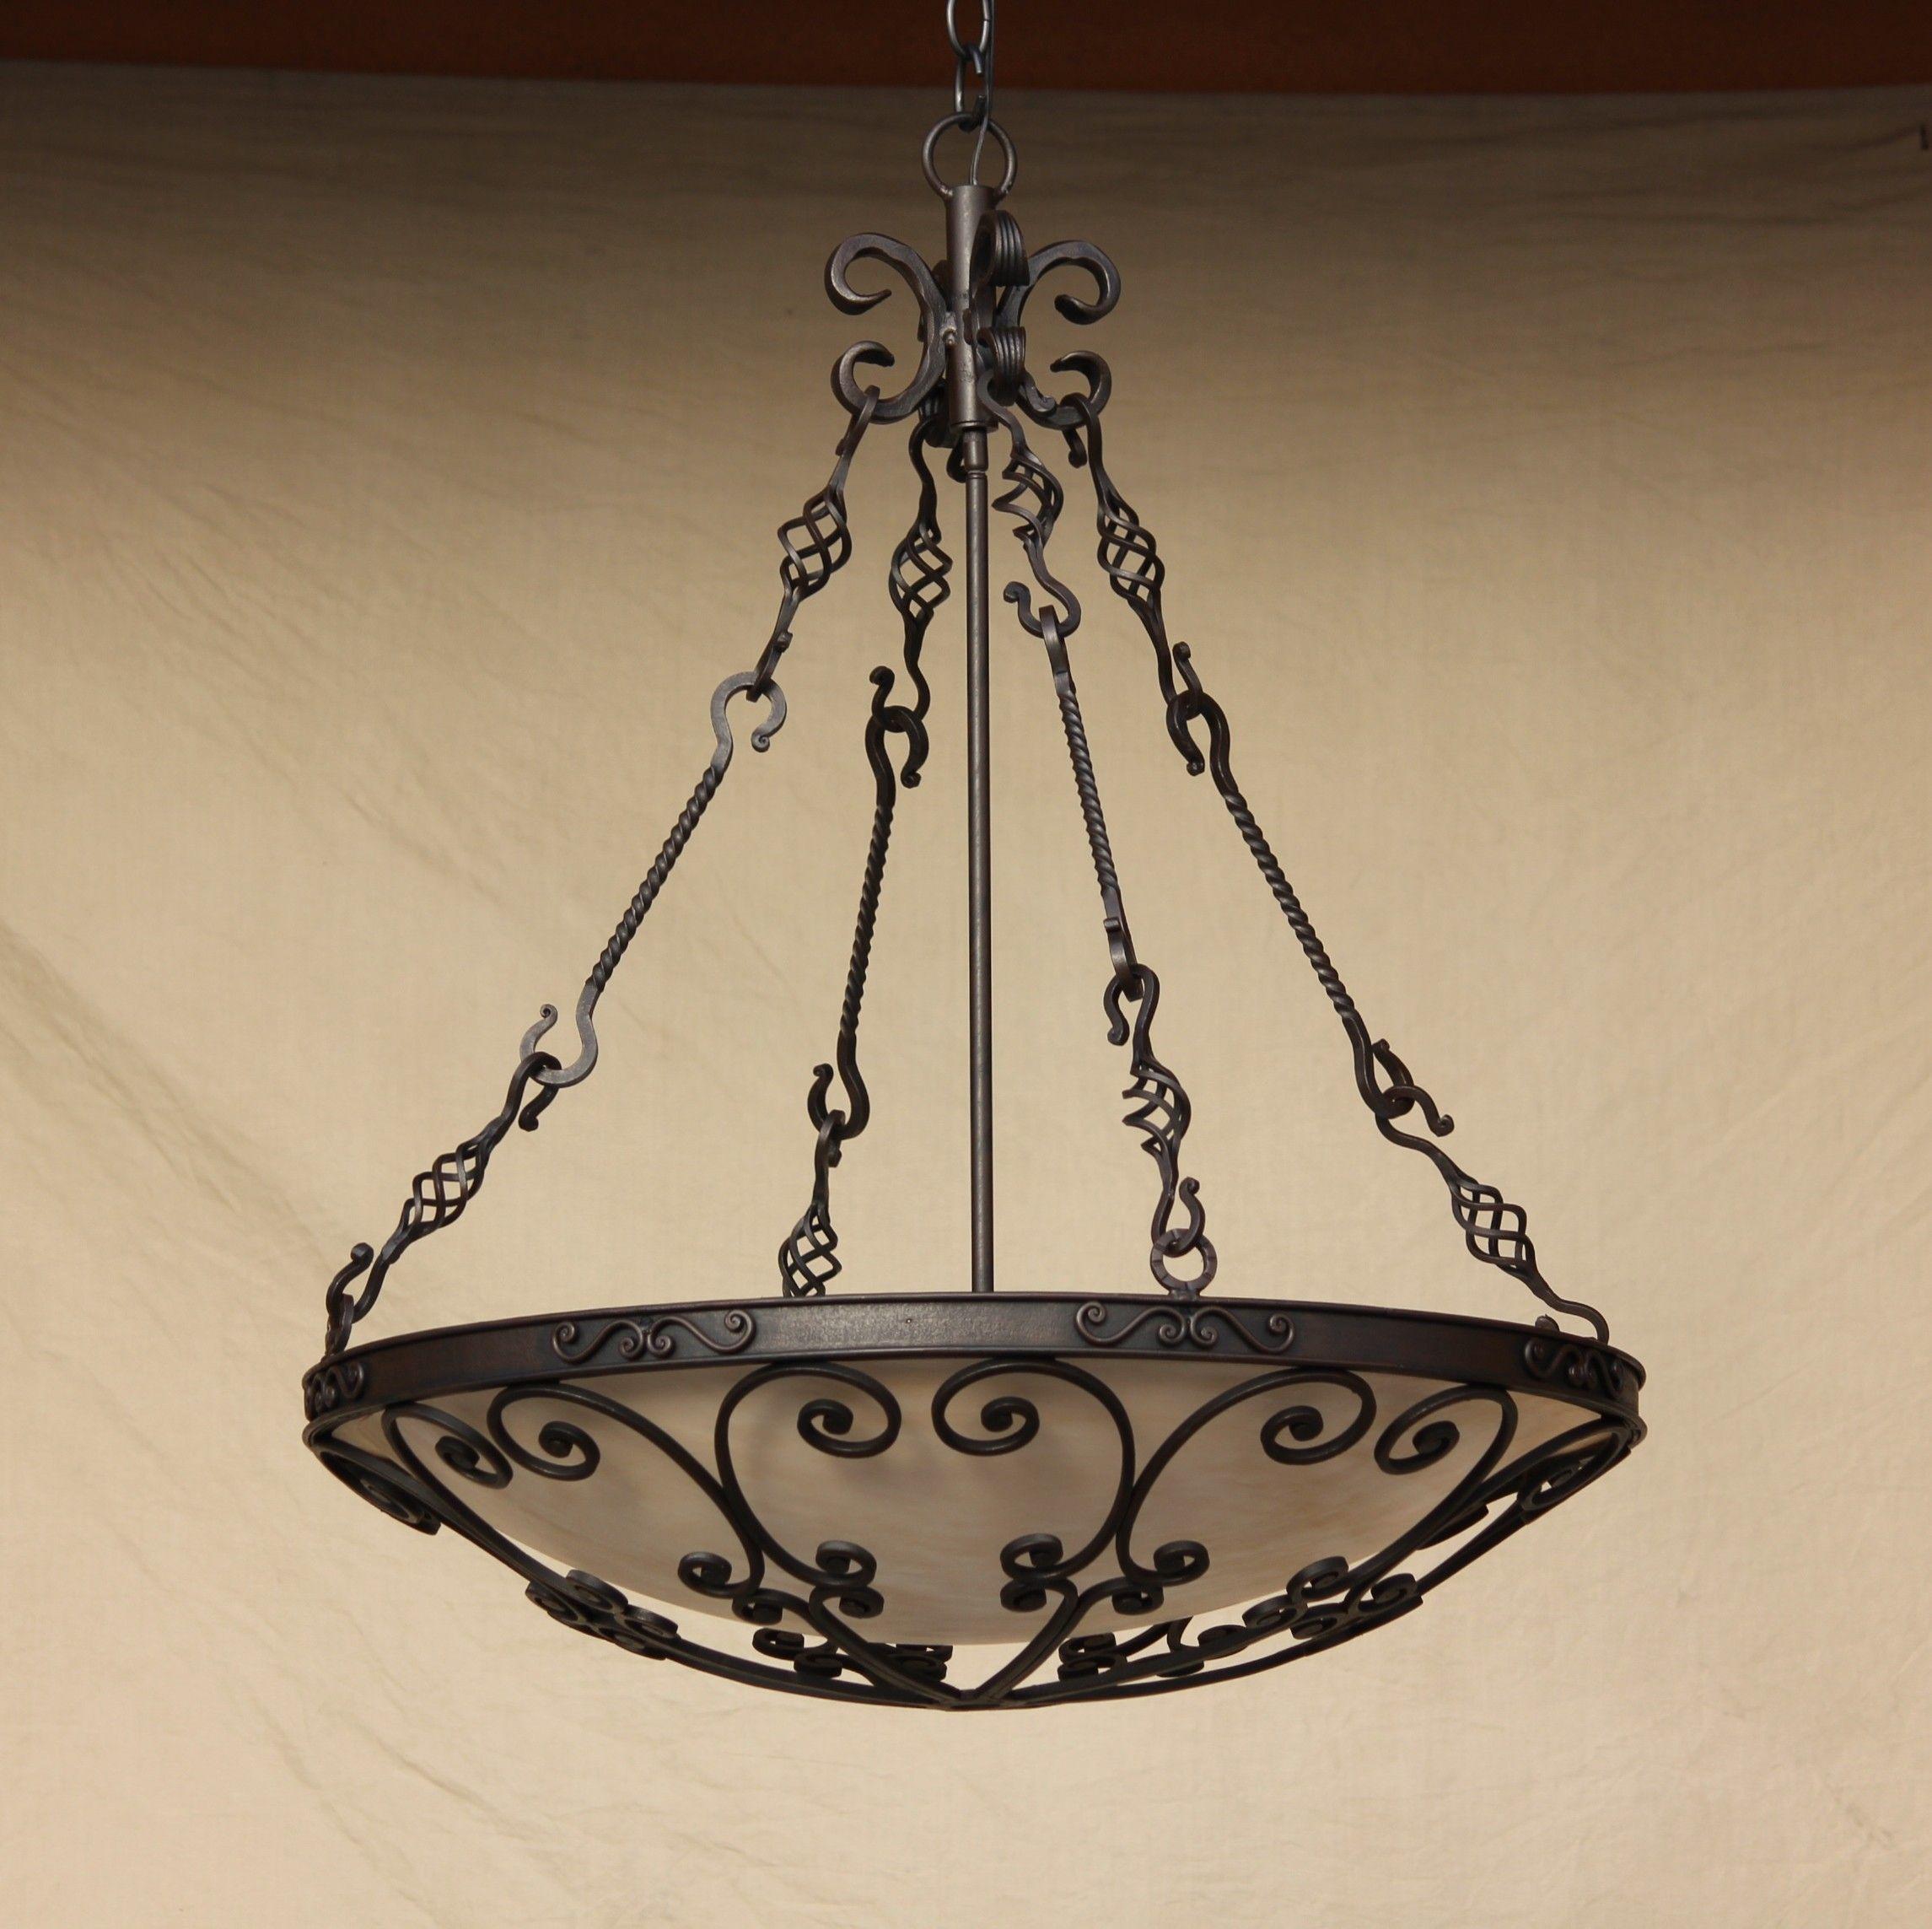 Pendant Lighting Hanging Hand Forged